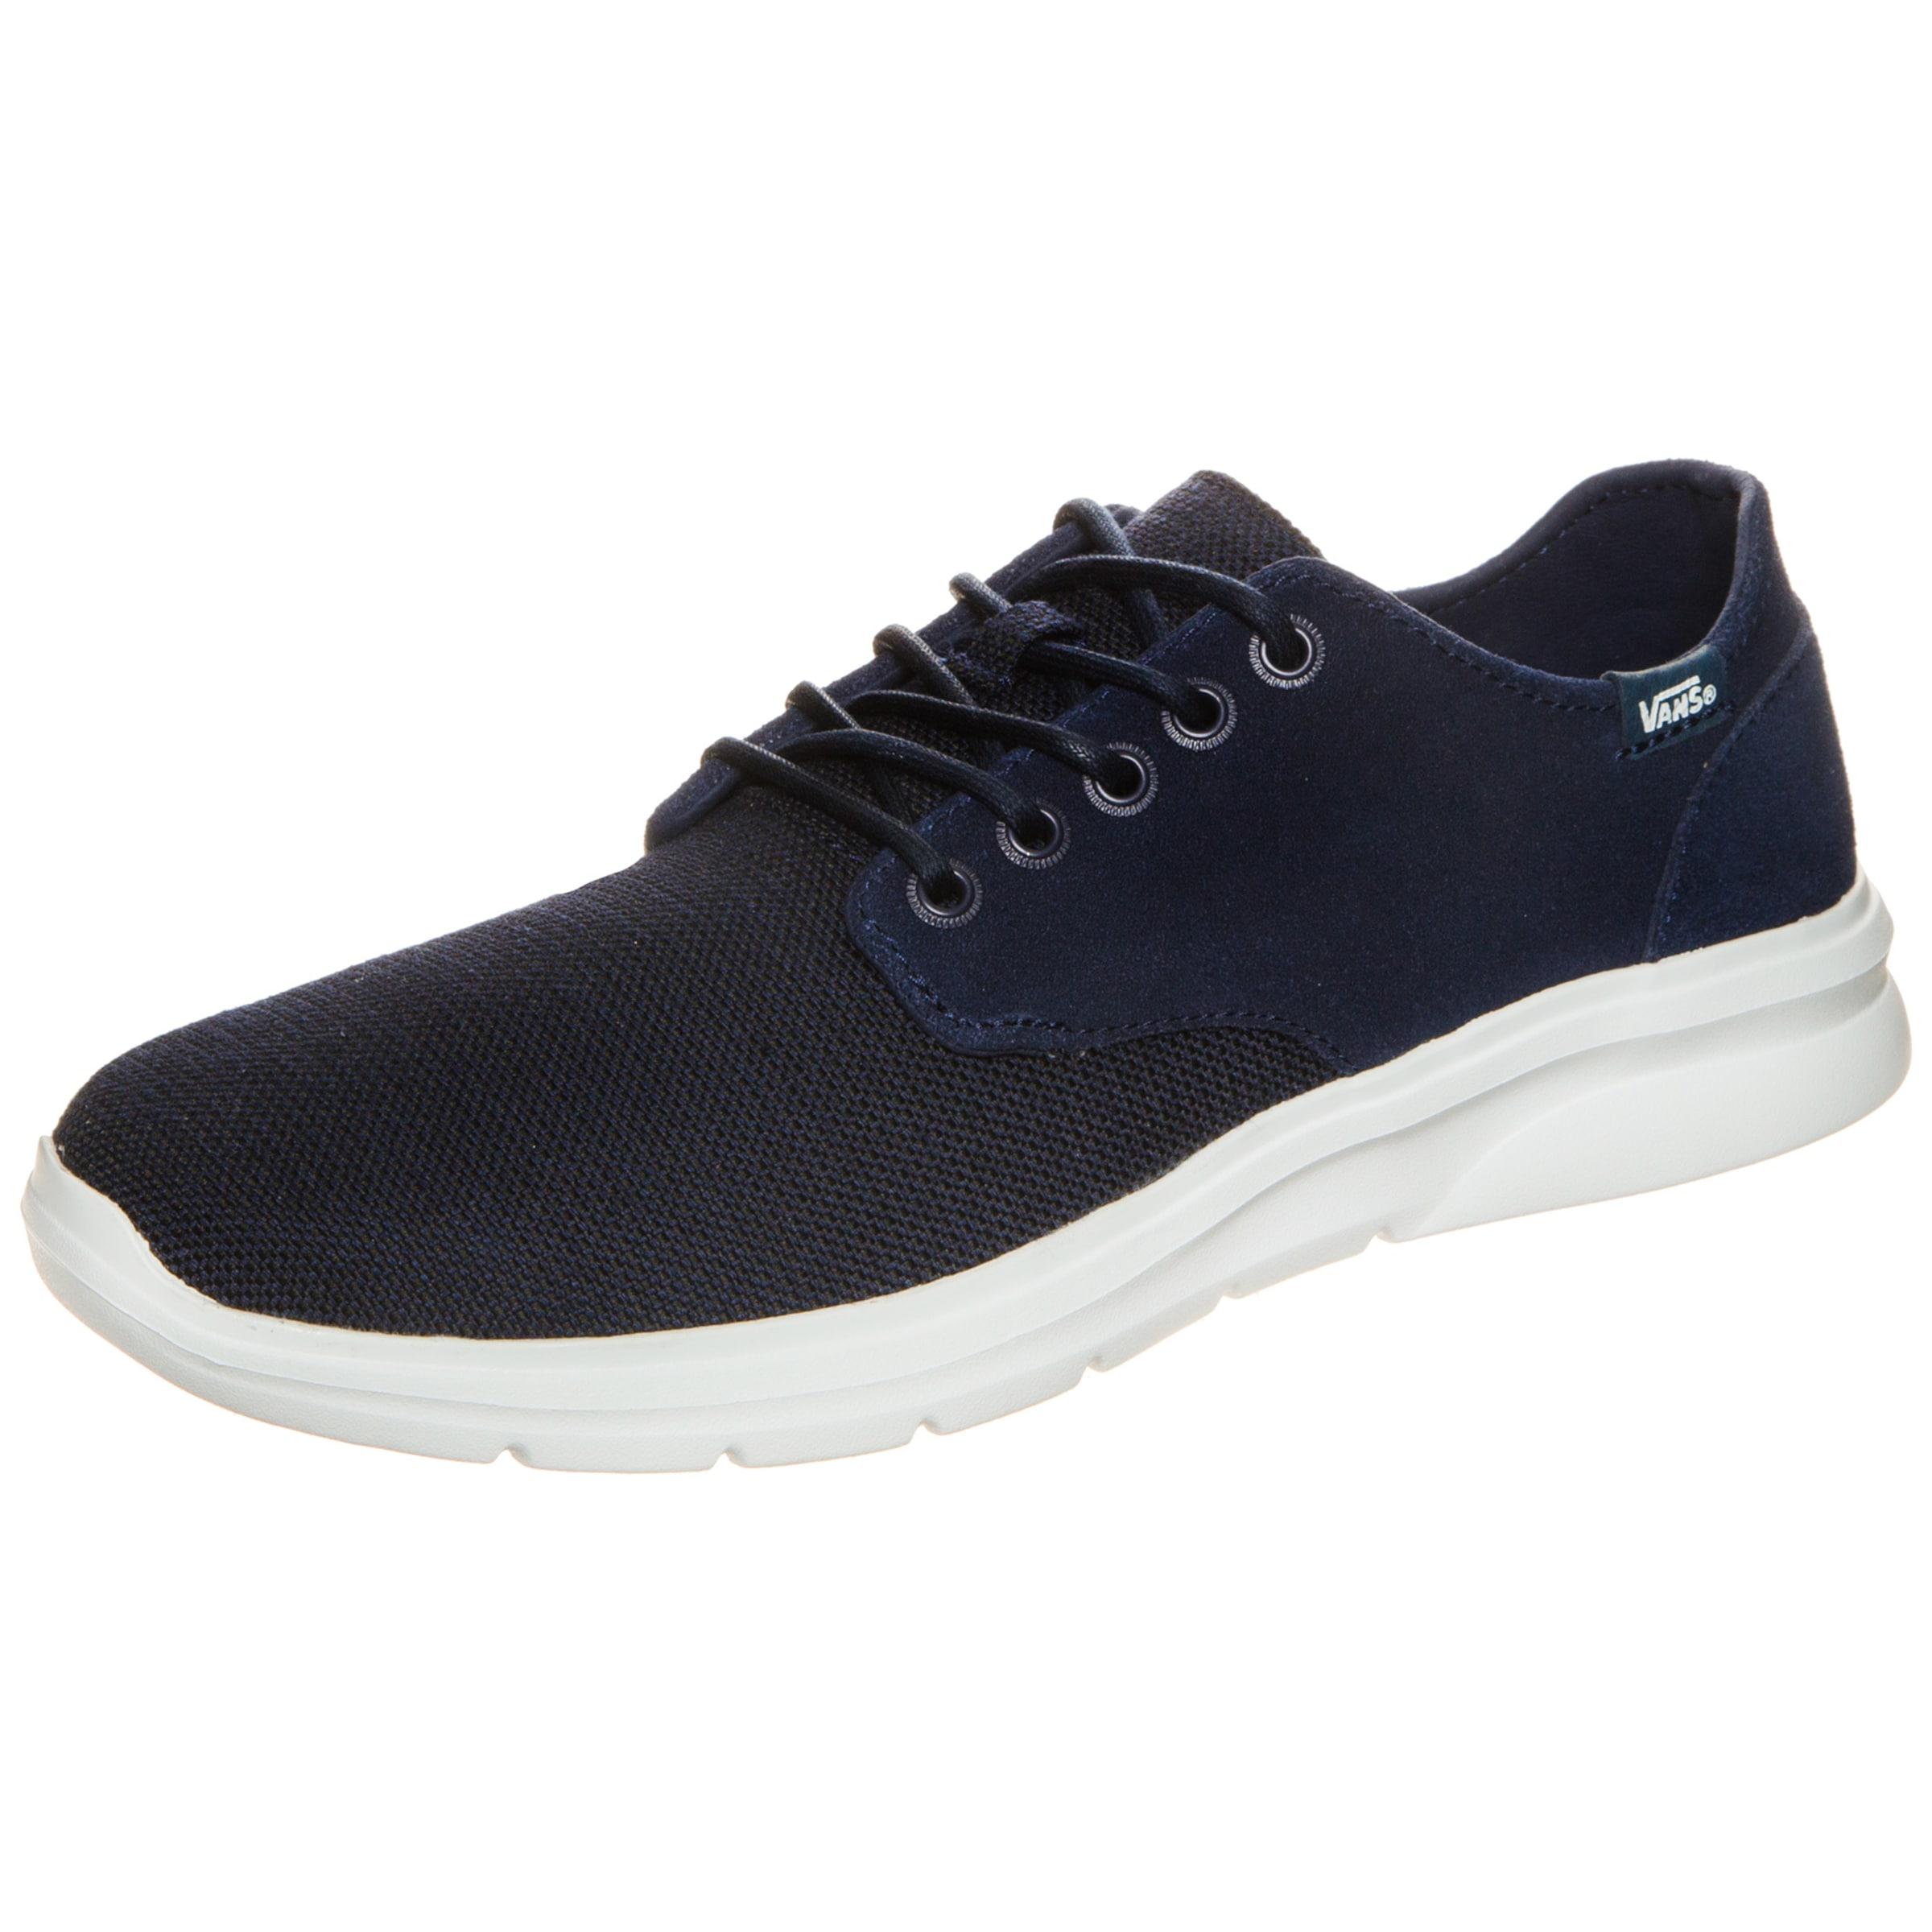 VANS Iso 2 Prime Sneaker Hohe Qualität